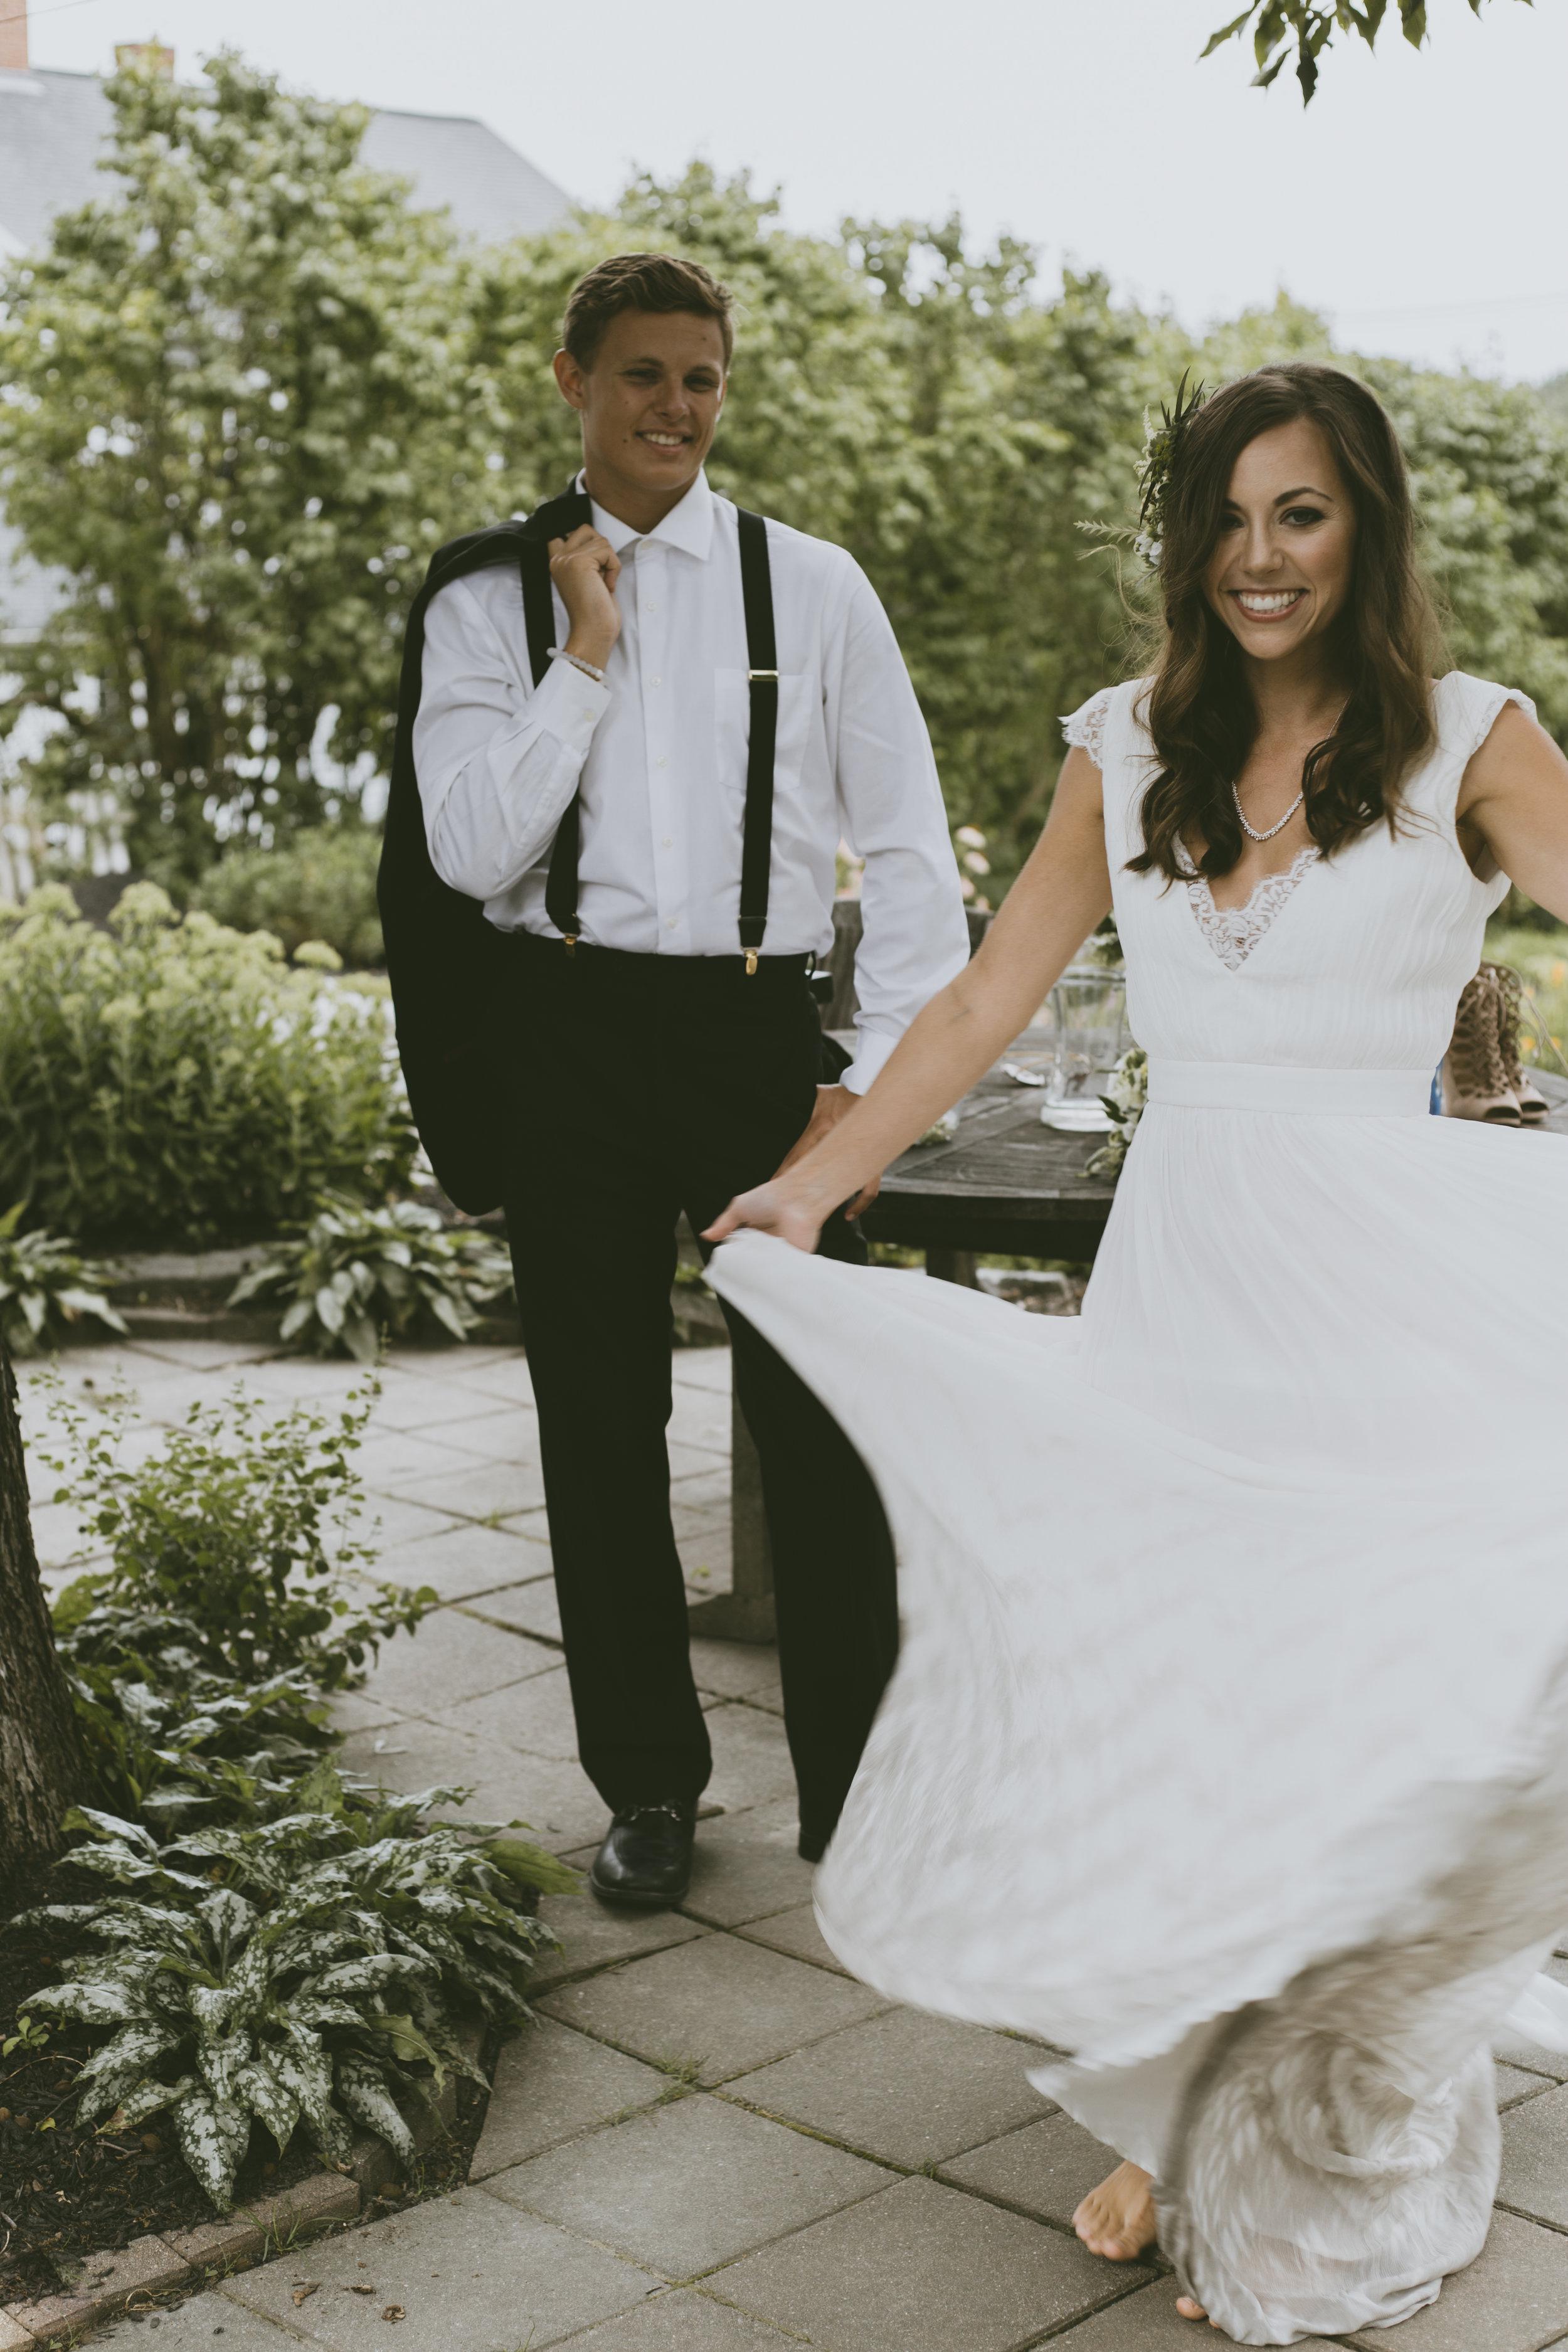 NamastePhotography_Weddings